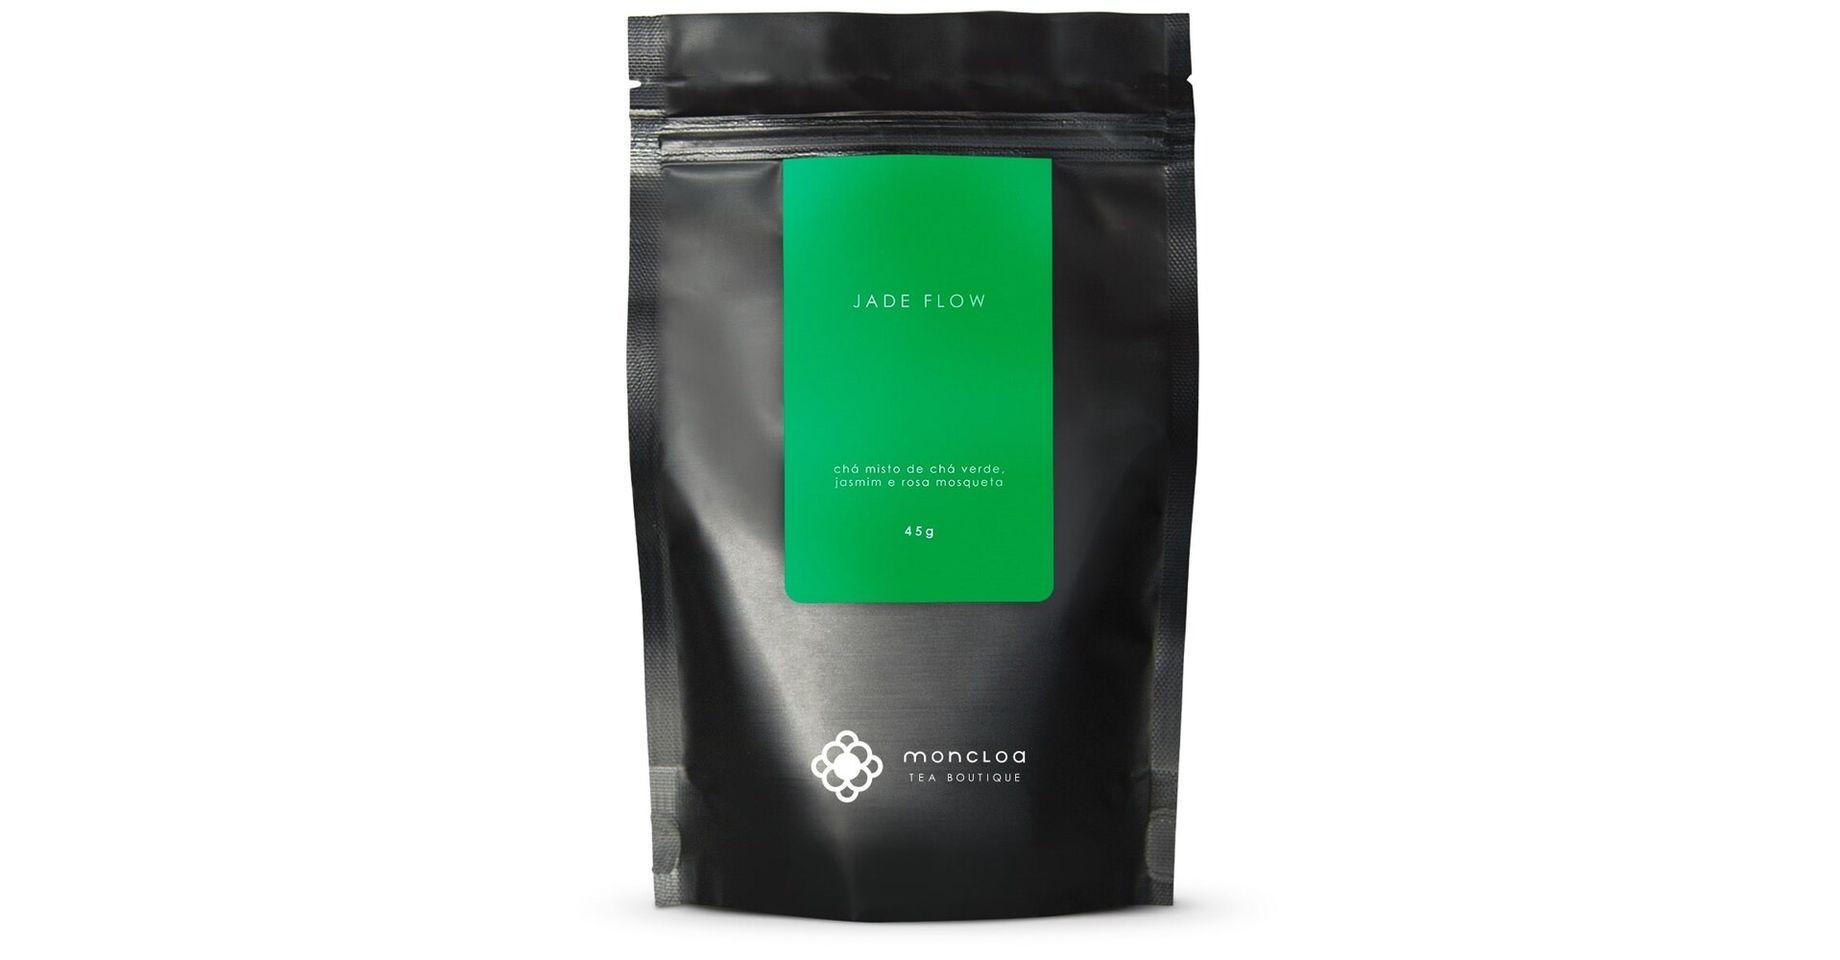 803625-Jade-Flow-Pouch